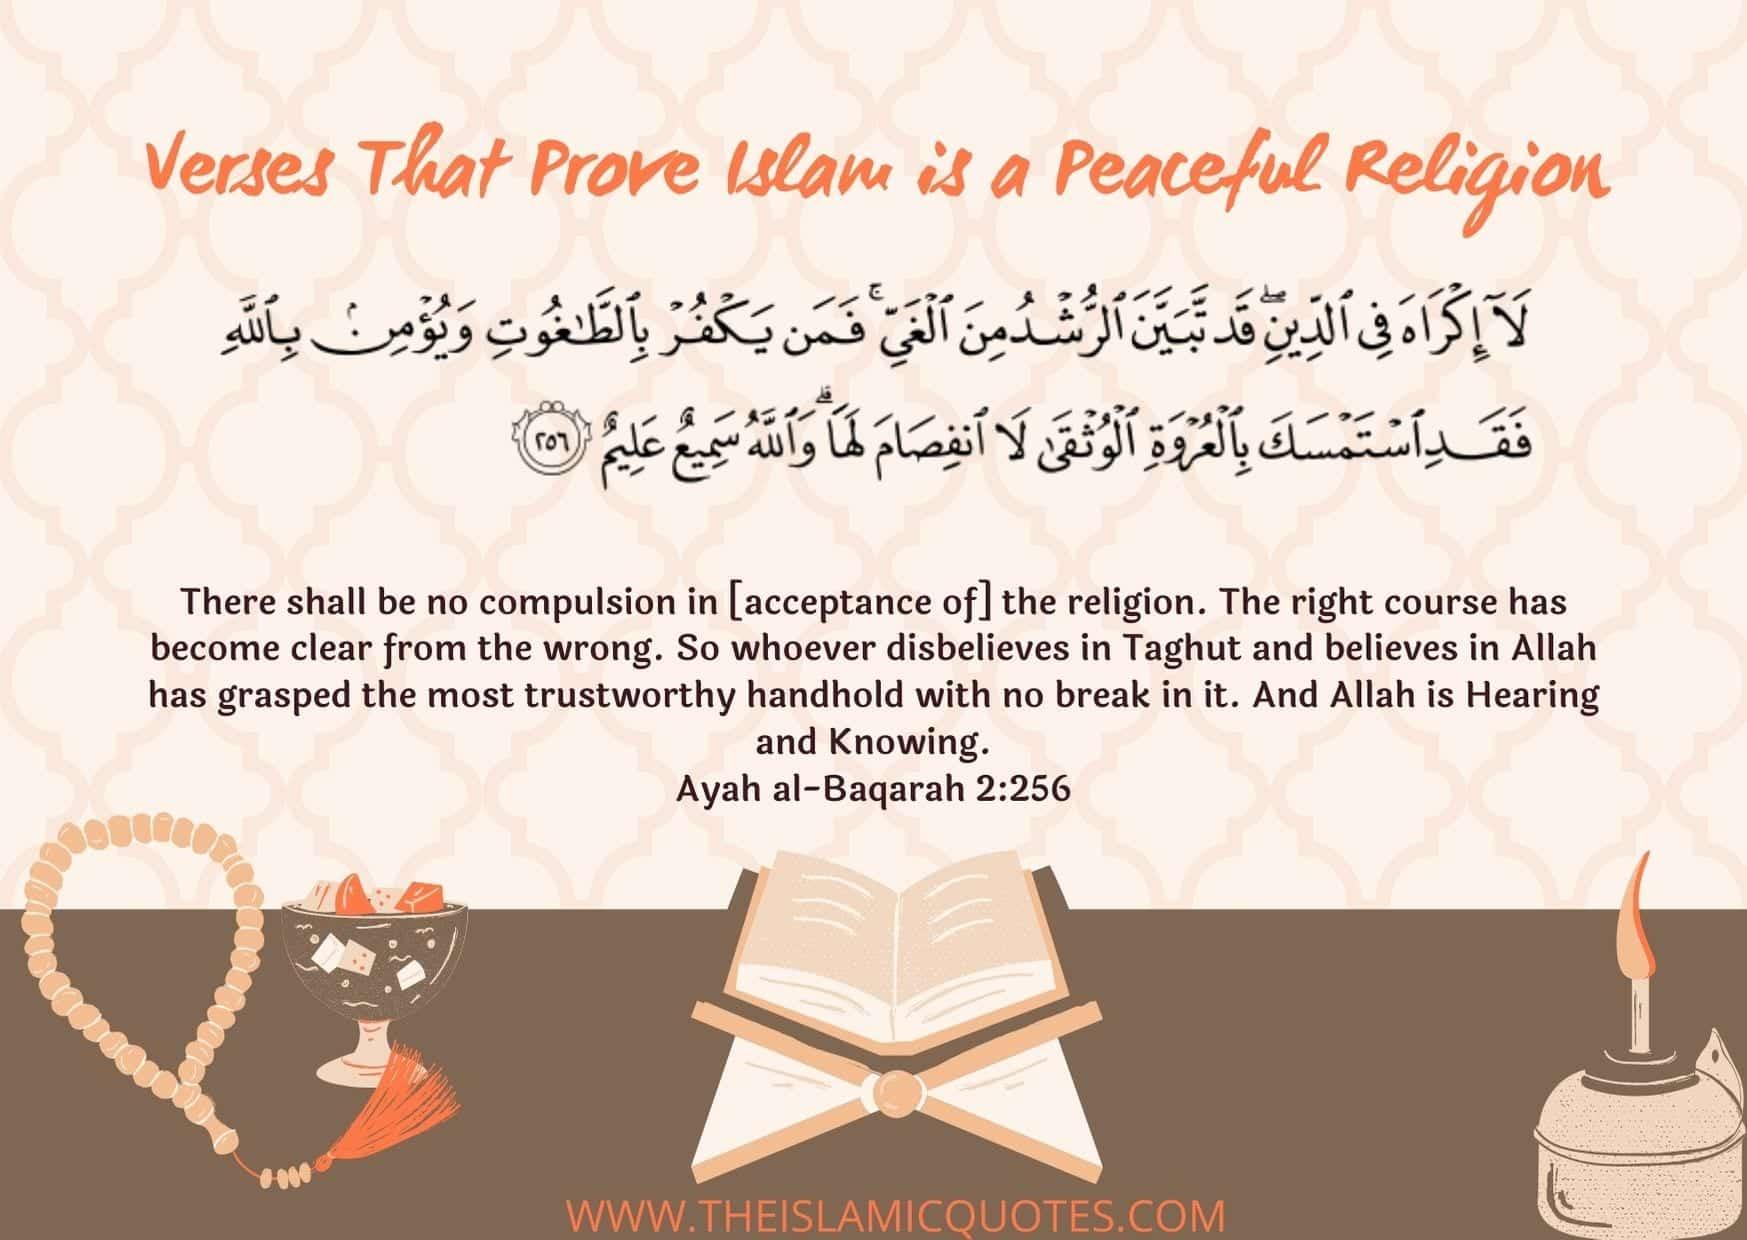 Quranic Verses on Peace